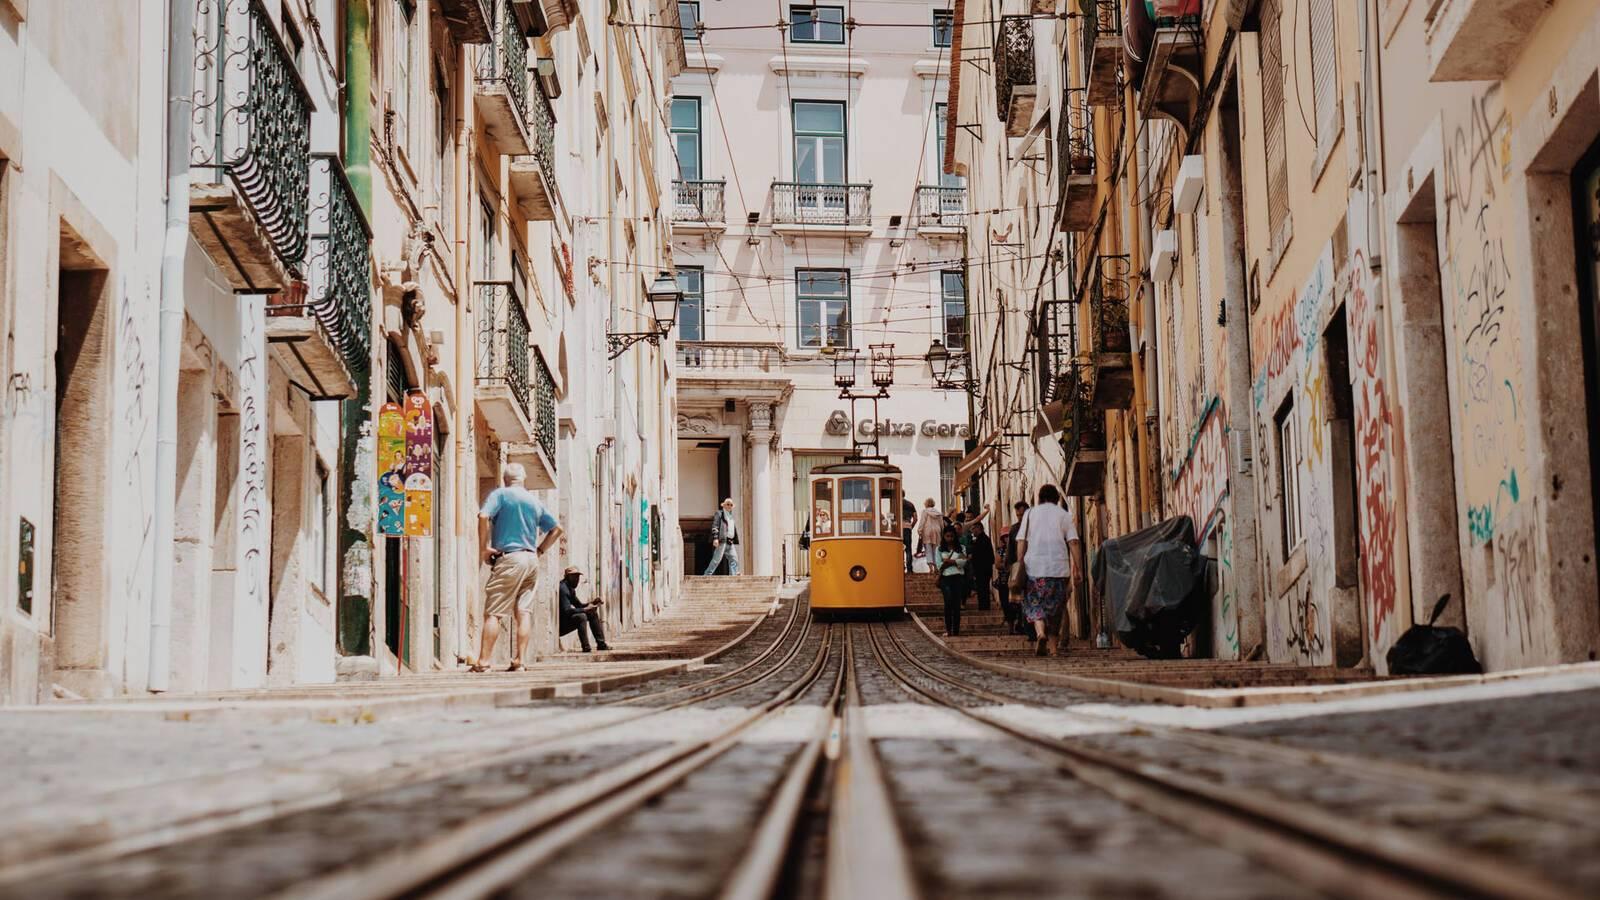 Lisbonne julian dik Portugal